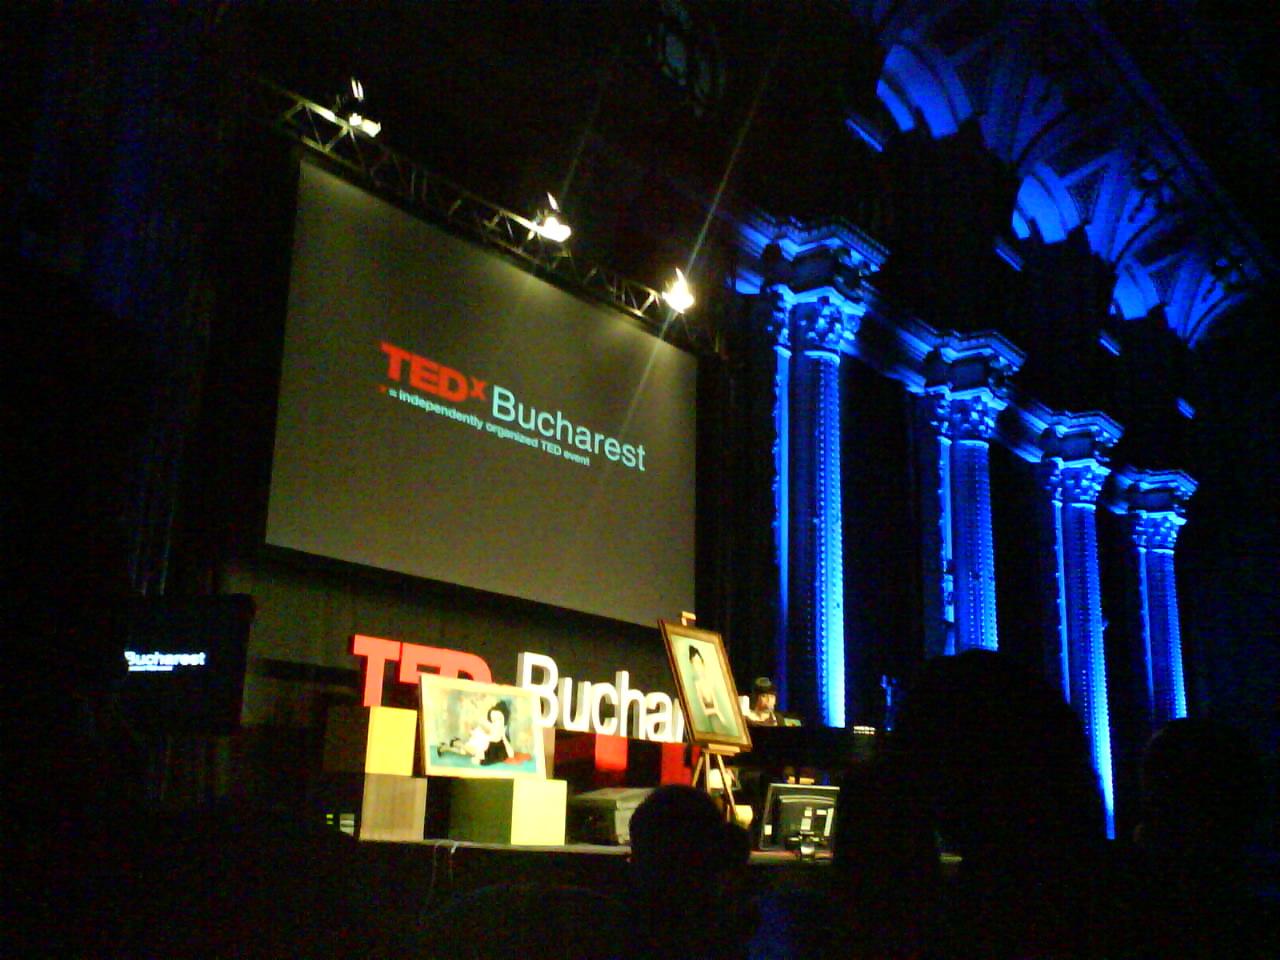 TEDxBucharest 2012 alexandrina